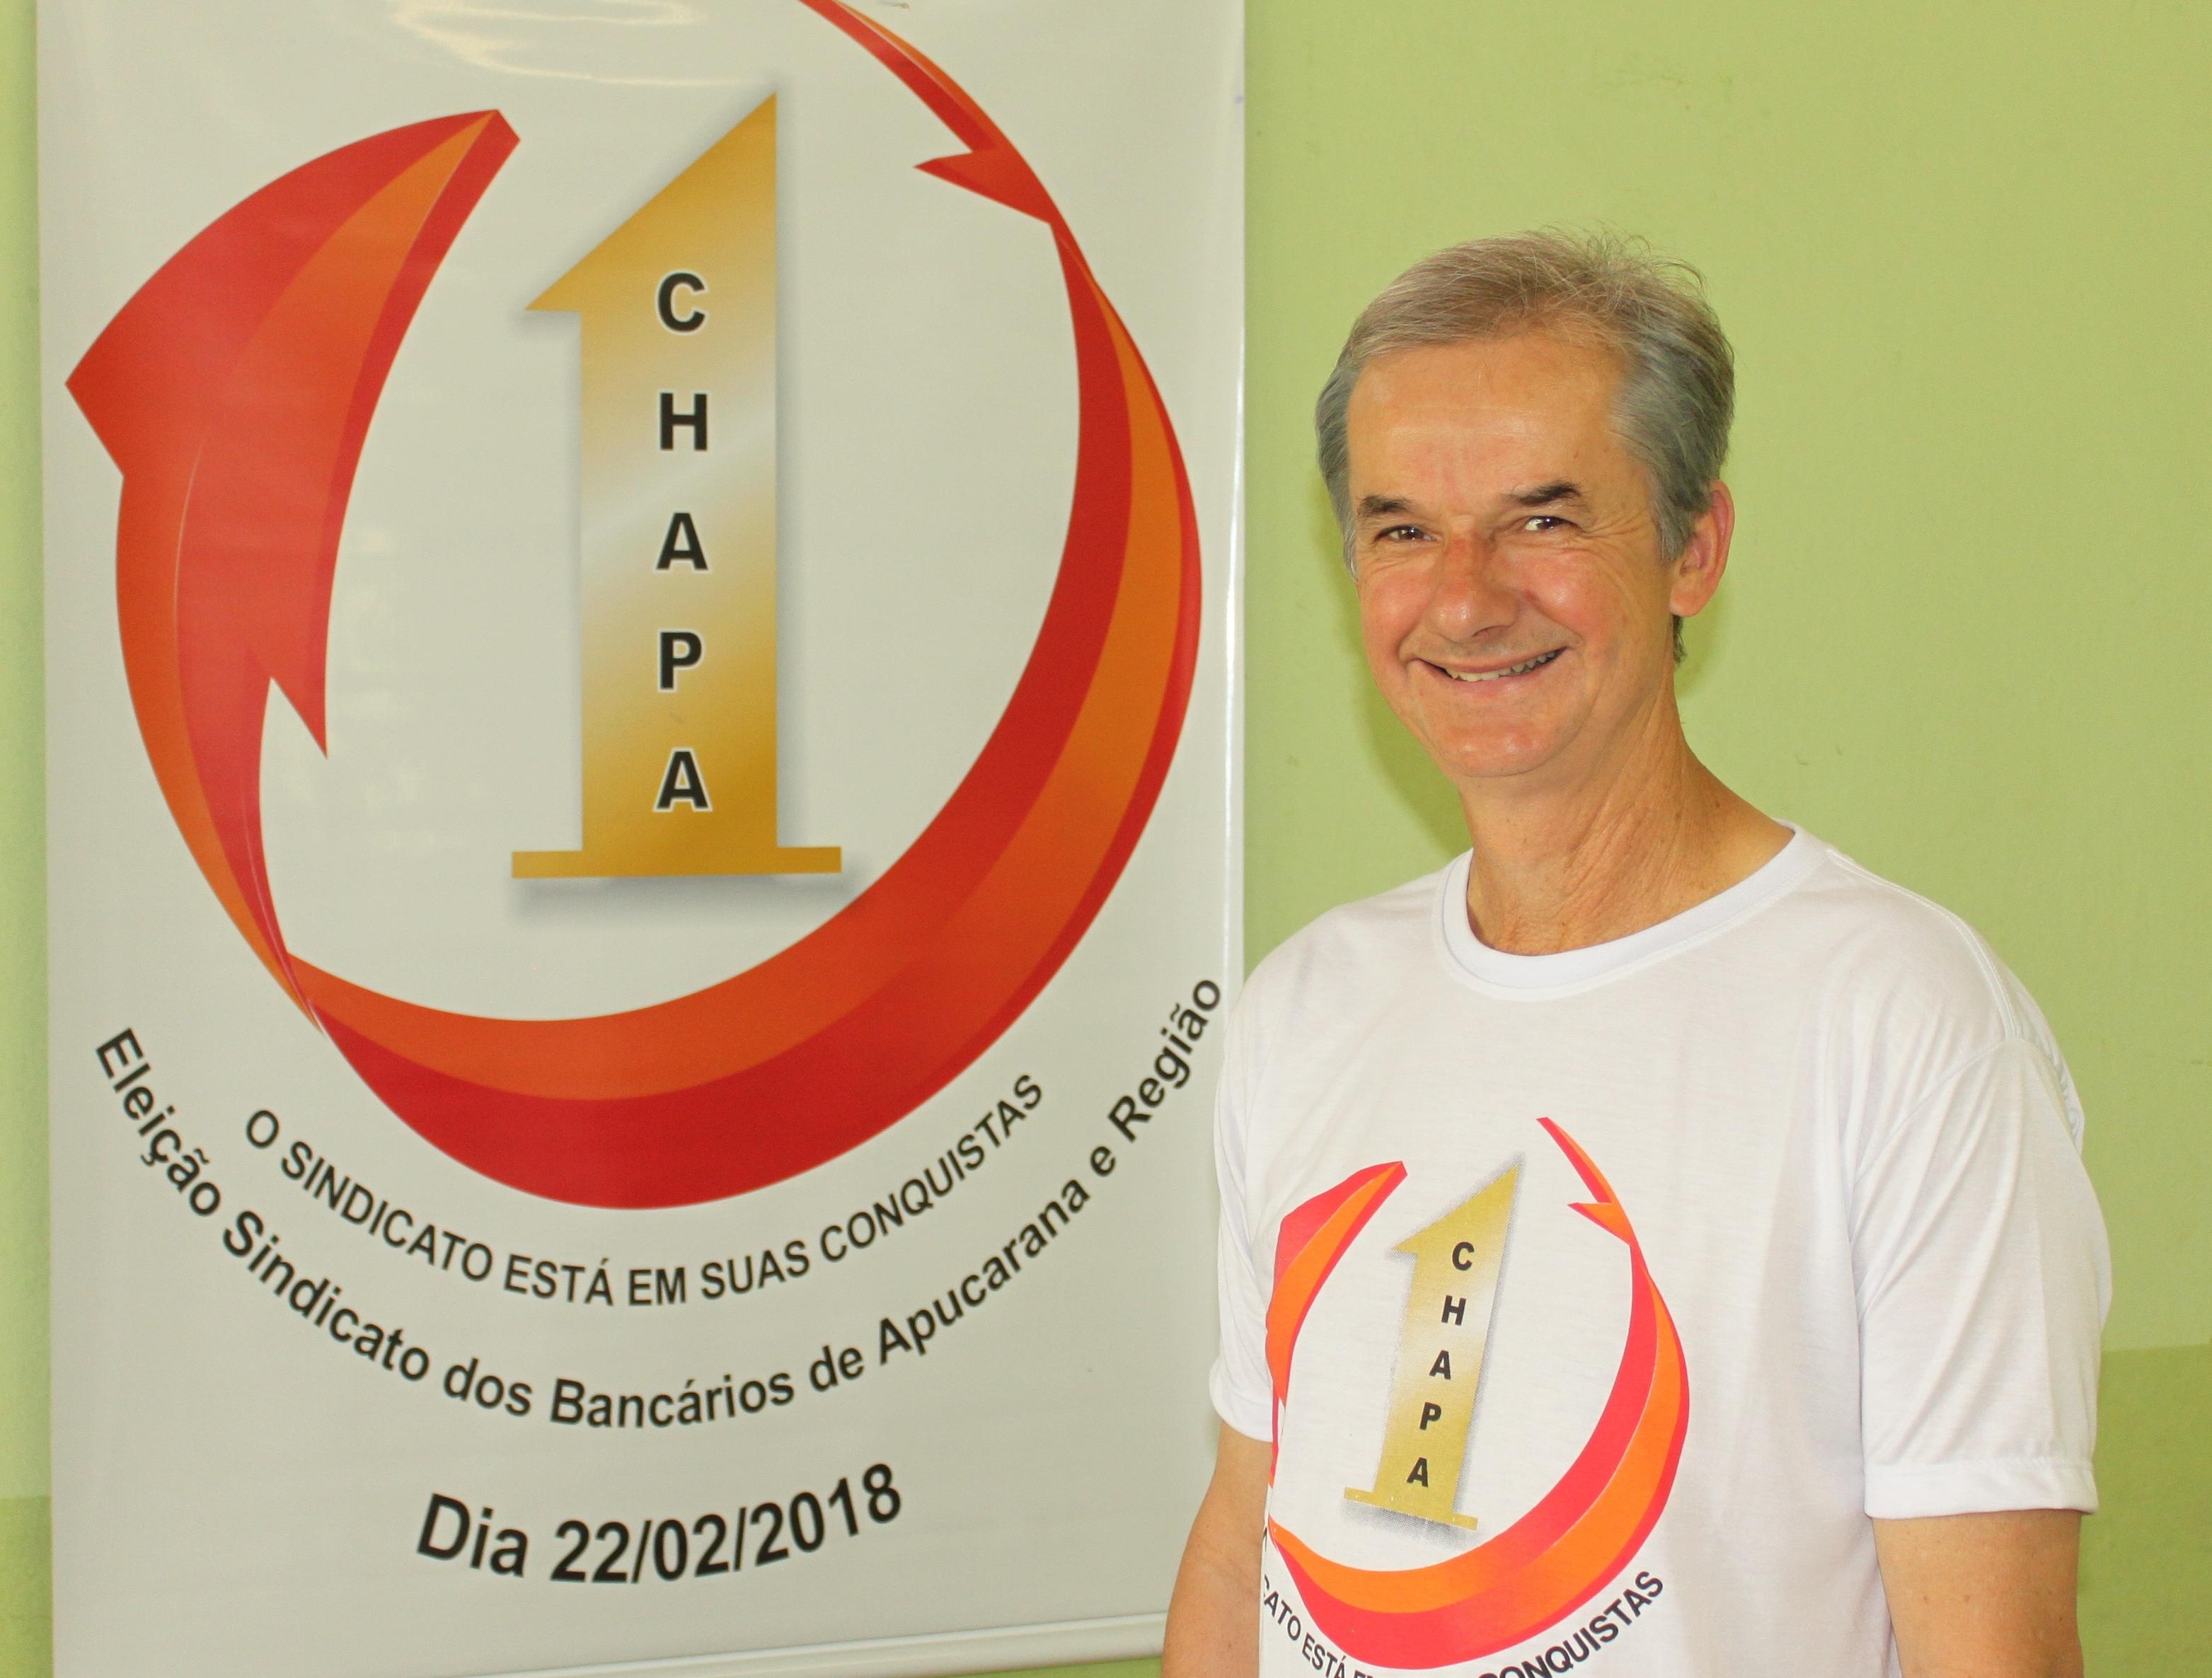 José Roberto Brasileiro - Presidente Bradesco Jandaia do Suol